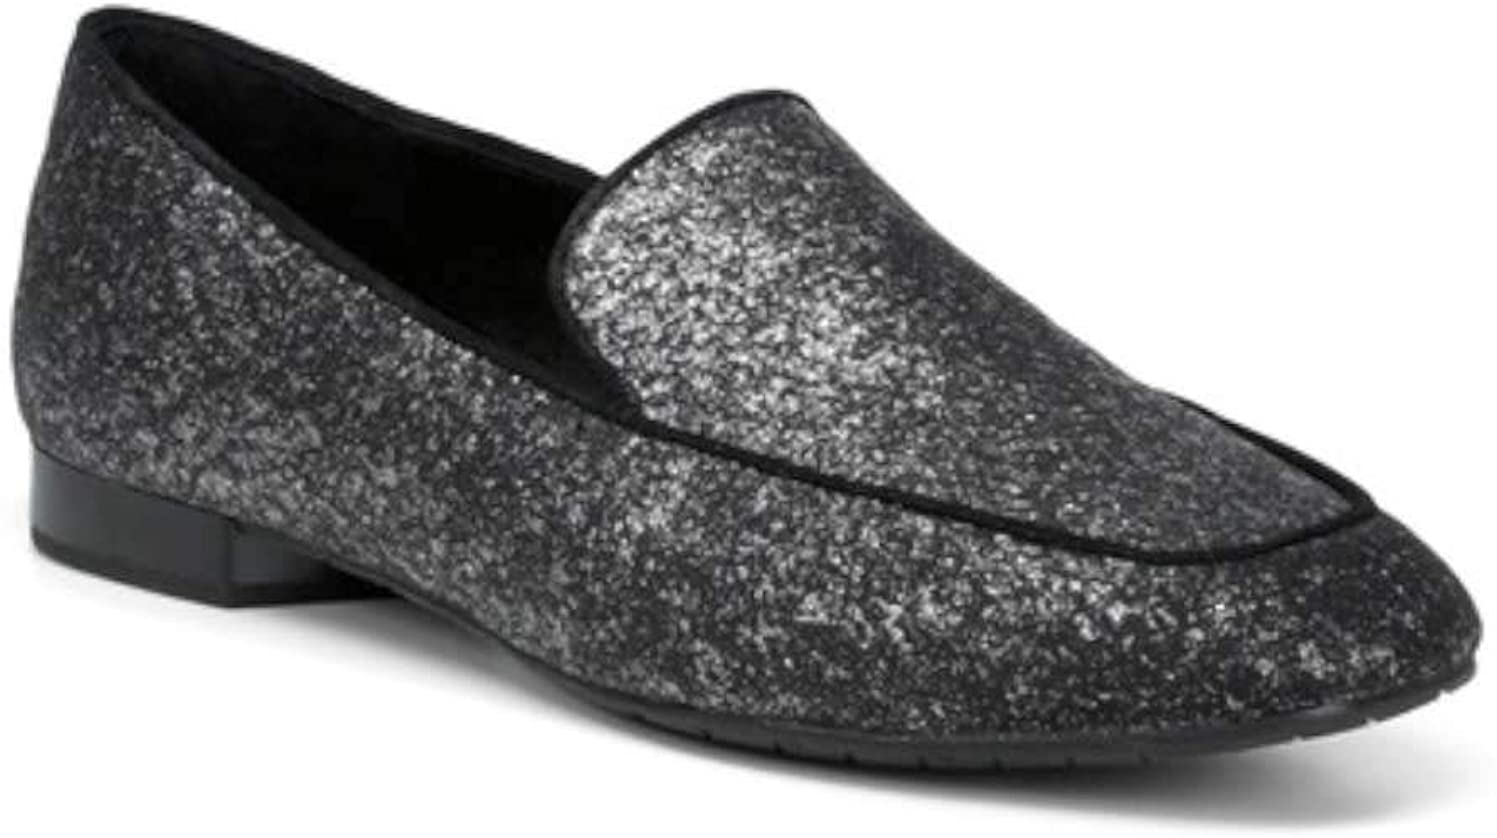 Donald J Pliner Womens Honey G-7 Closed Toe Loafers